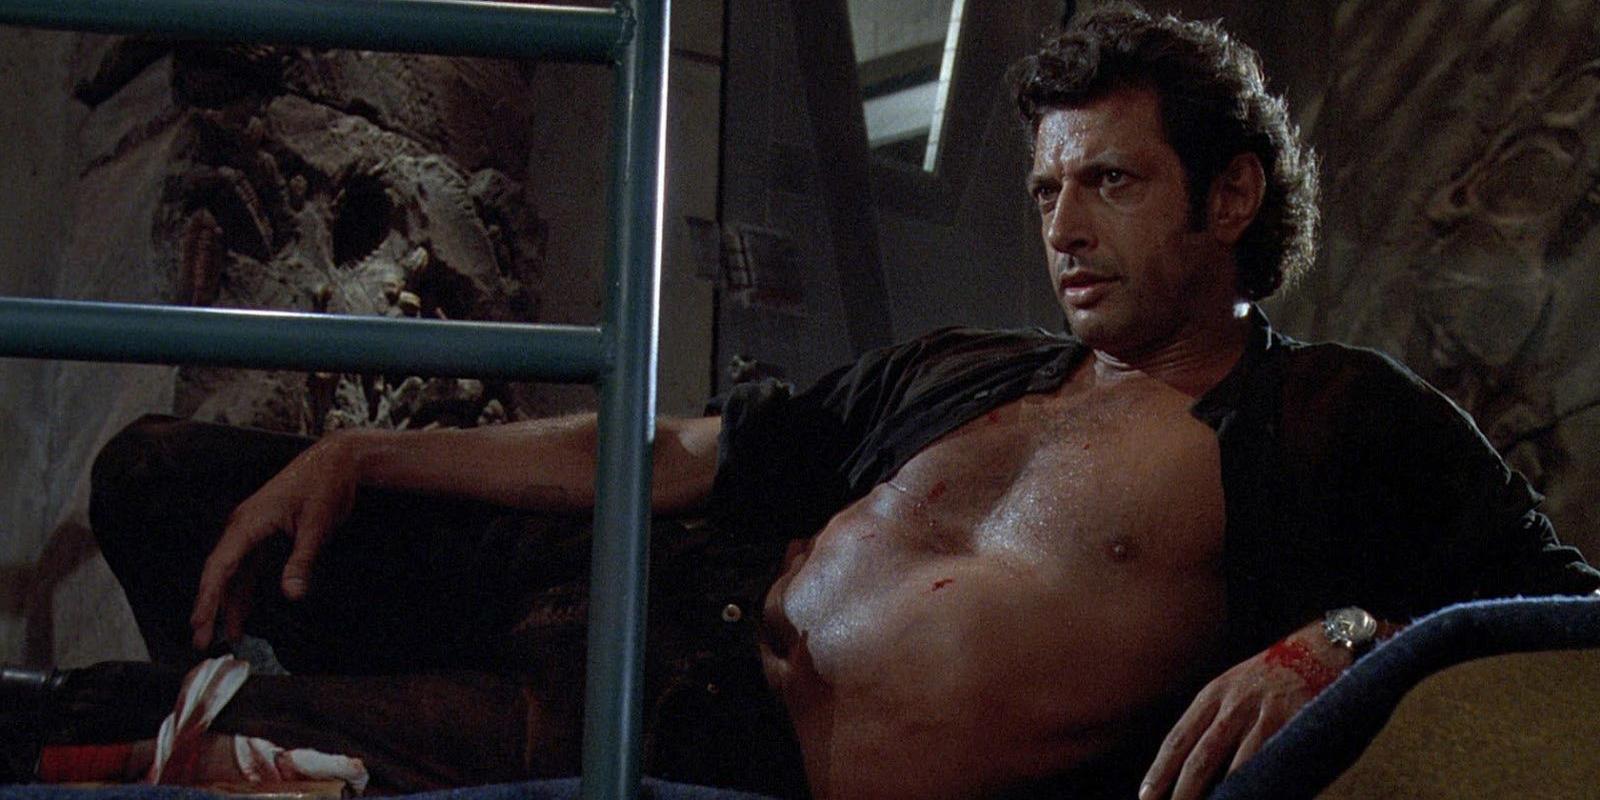 Jurassic Park Funko Figures Include Shirtless Goldblum